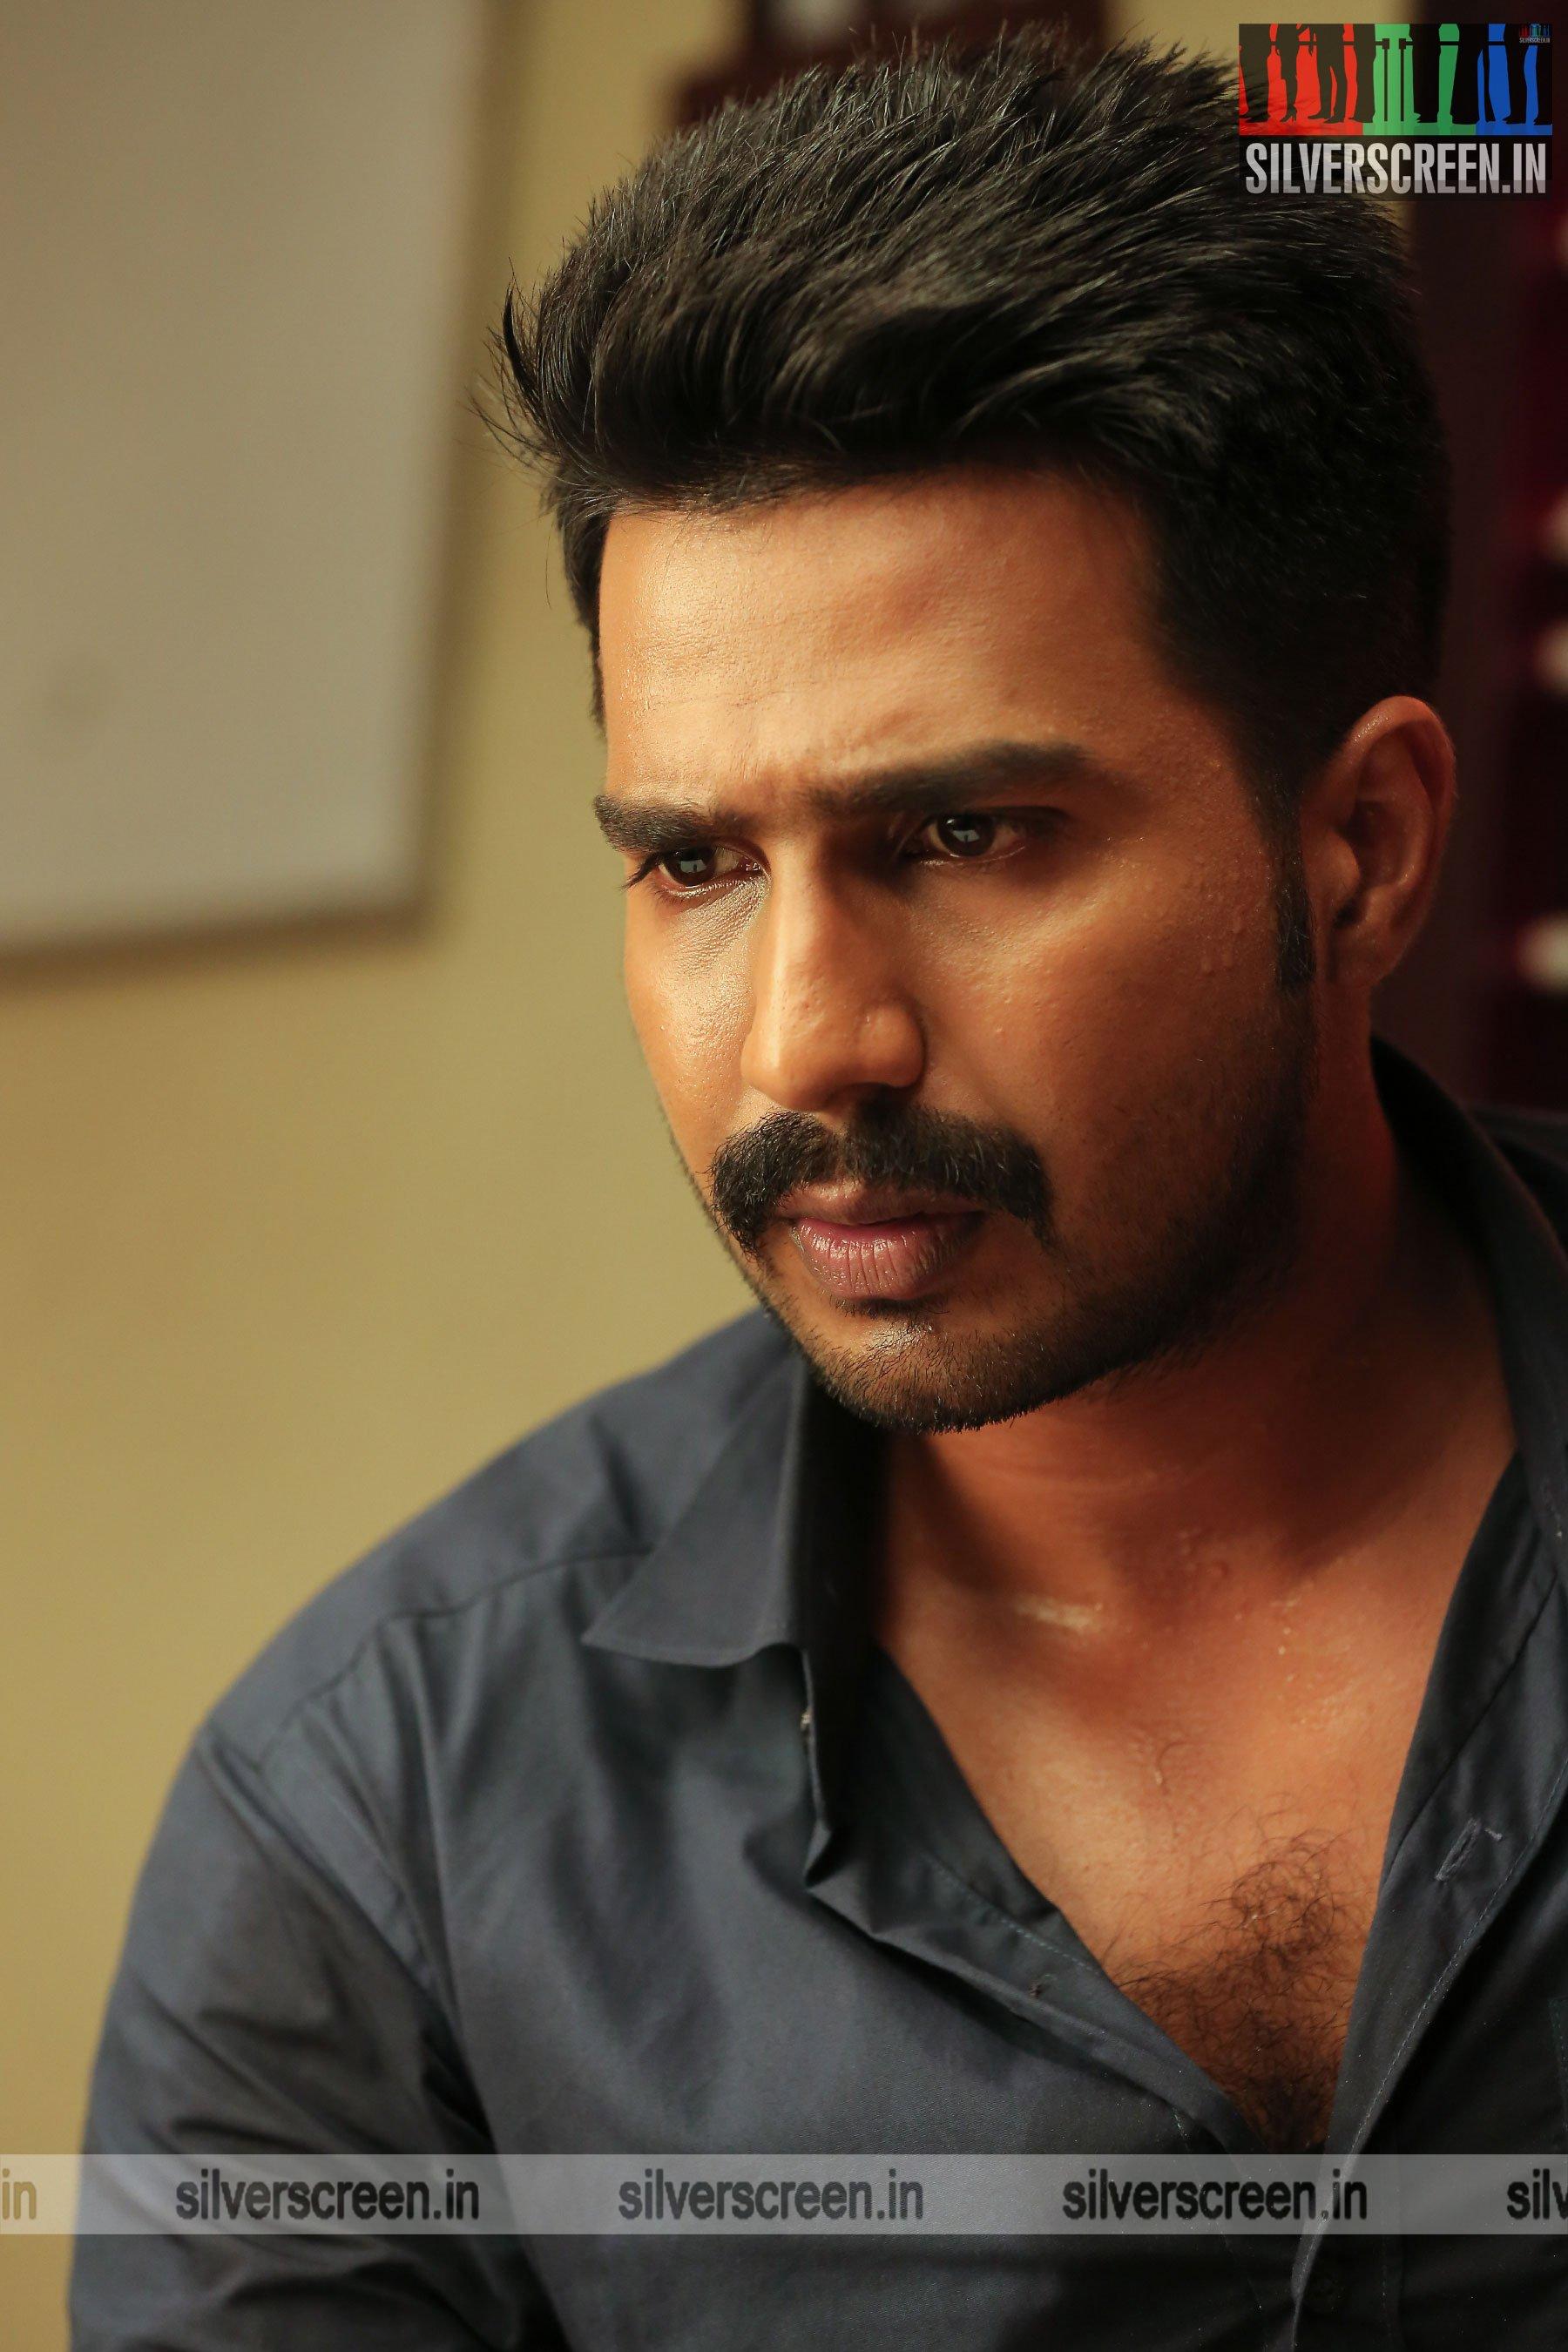 Ratsasan Movie Stills Starring Vishnu Vishal – Silverscreen in